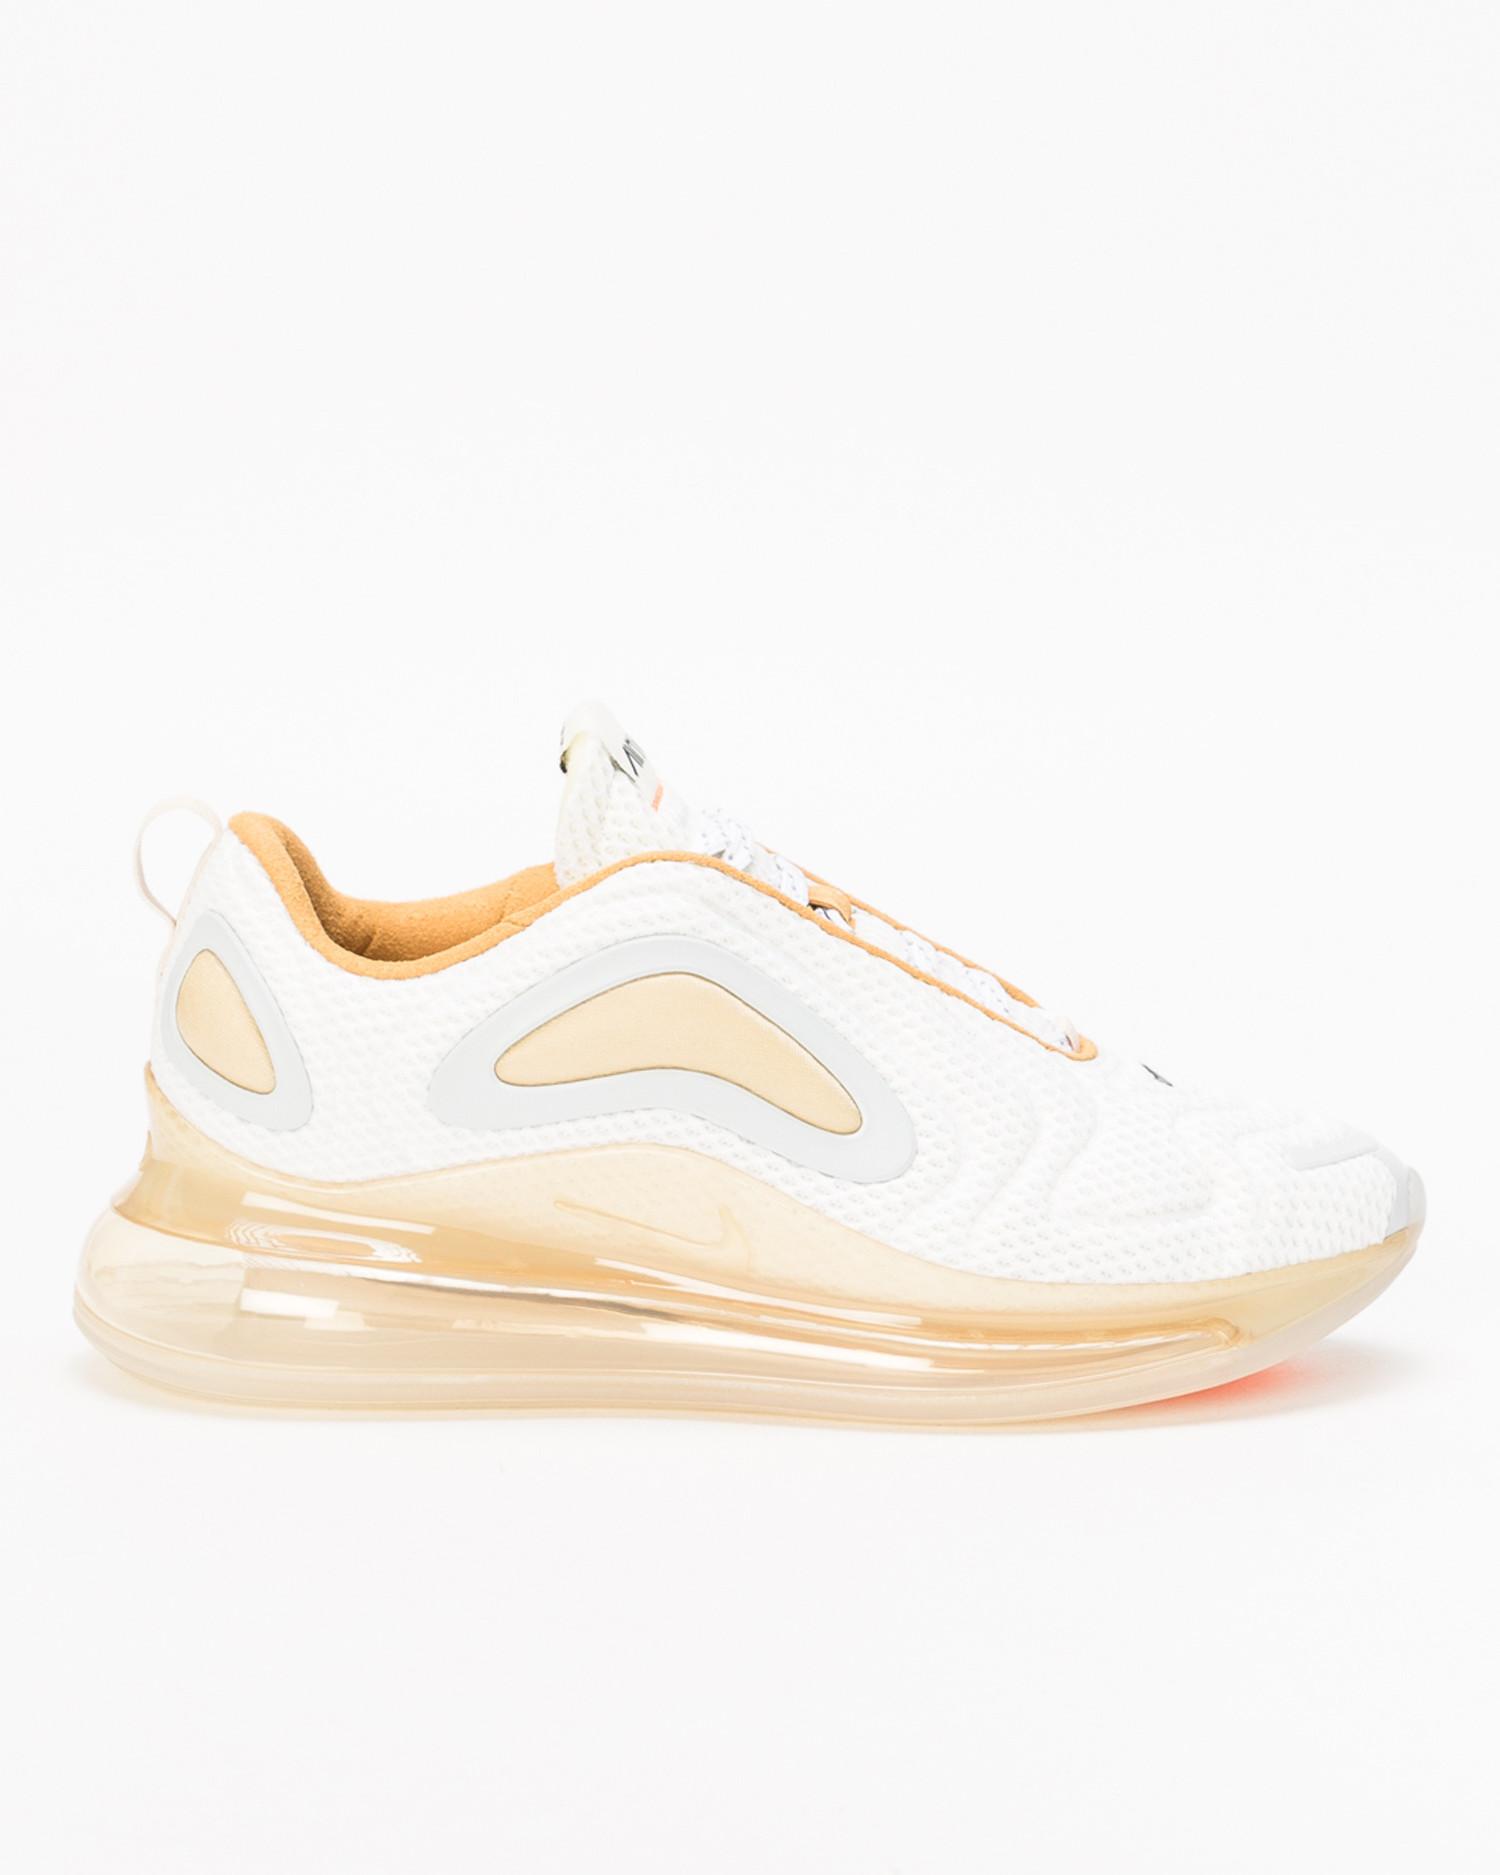 Nike Air Max 720 White/Anthracite-Pale Vanilla